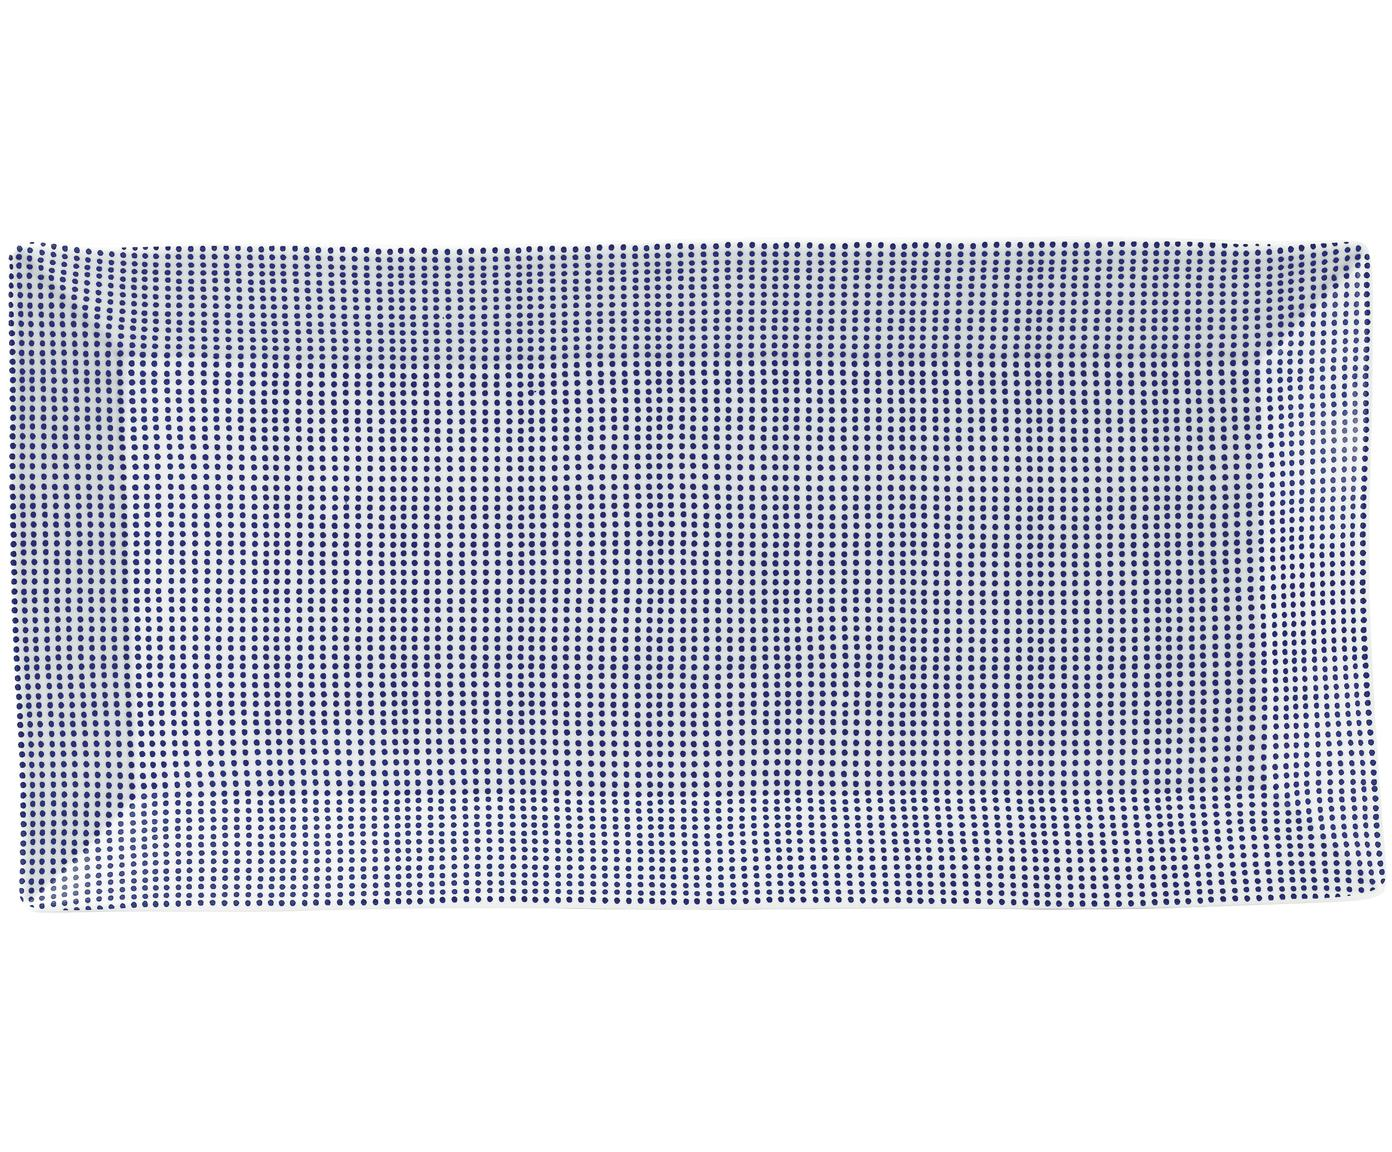 Fuente Pacific, Porcelana, Blanco, azul, L 39 x An 18 cm